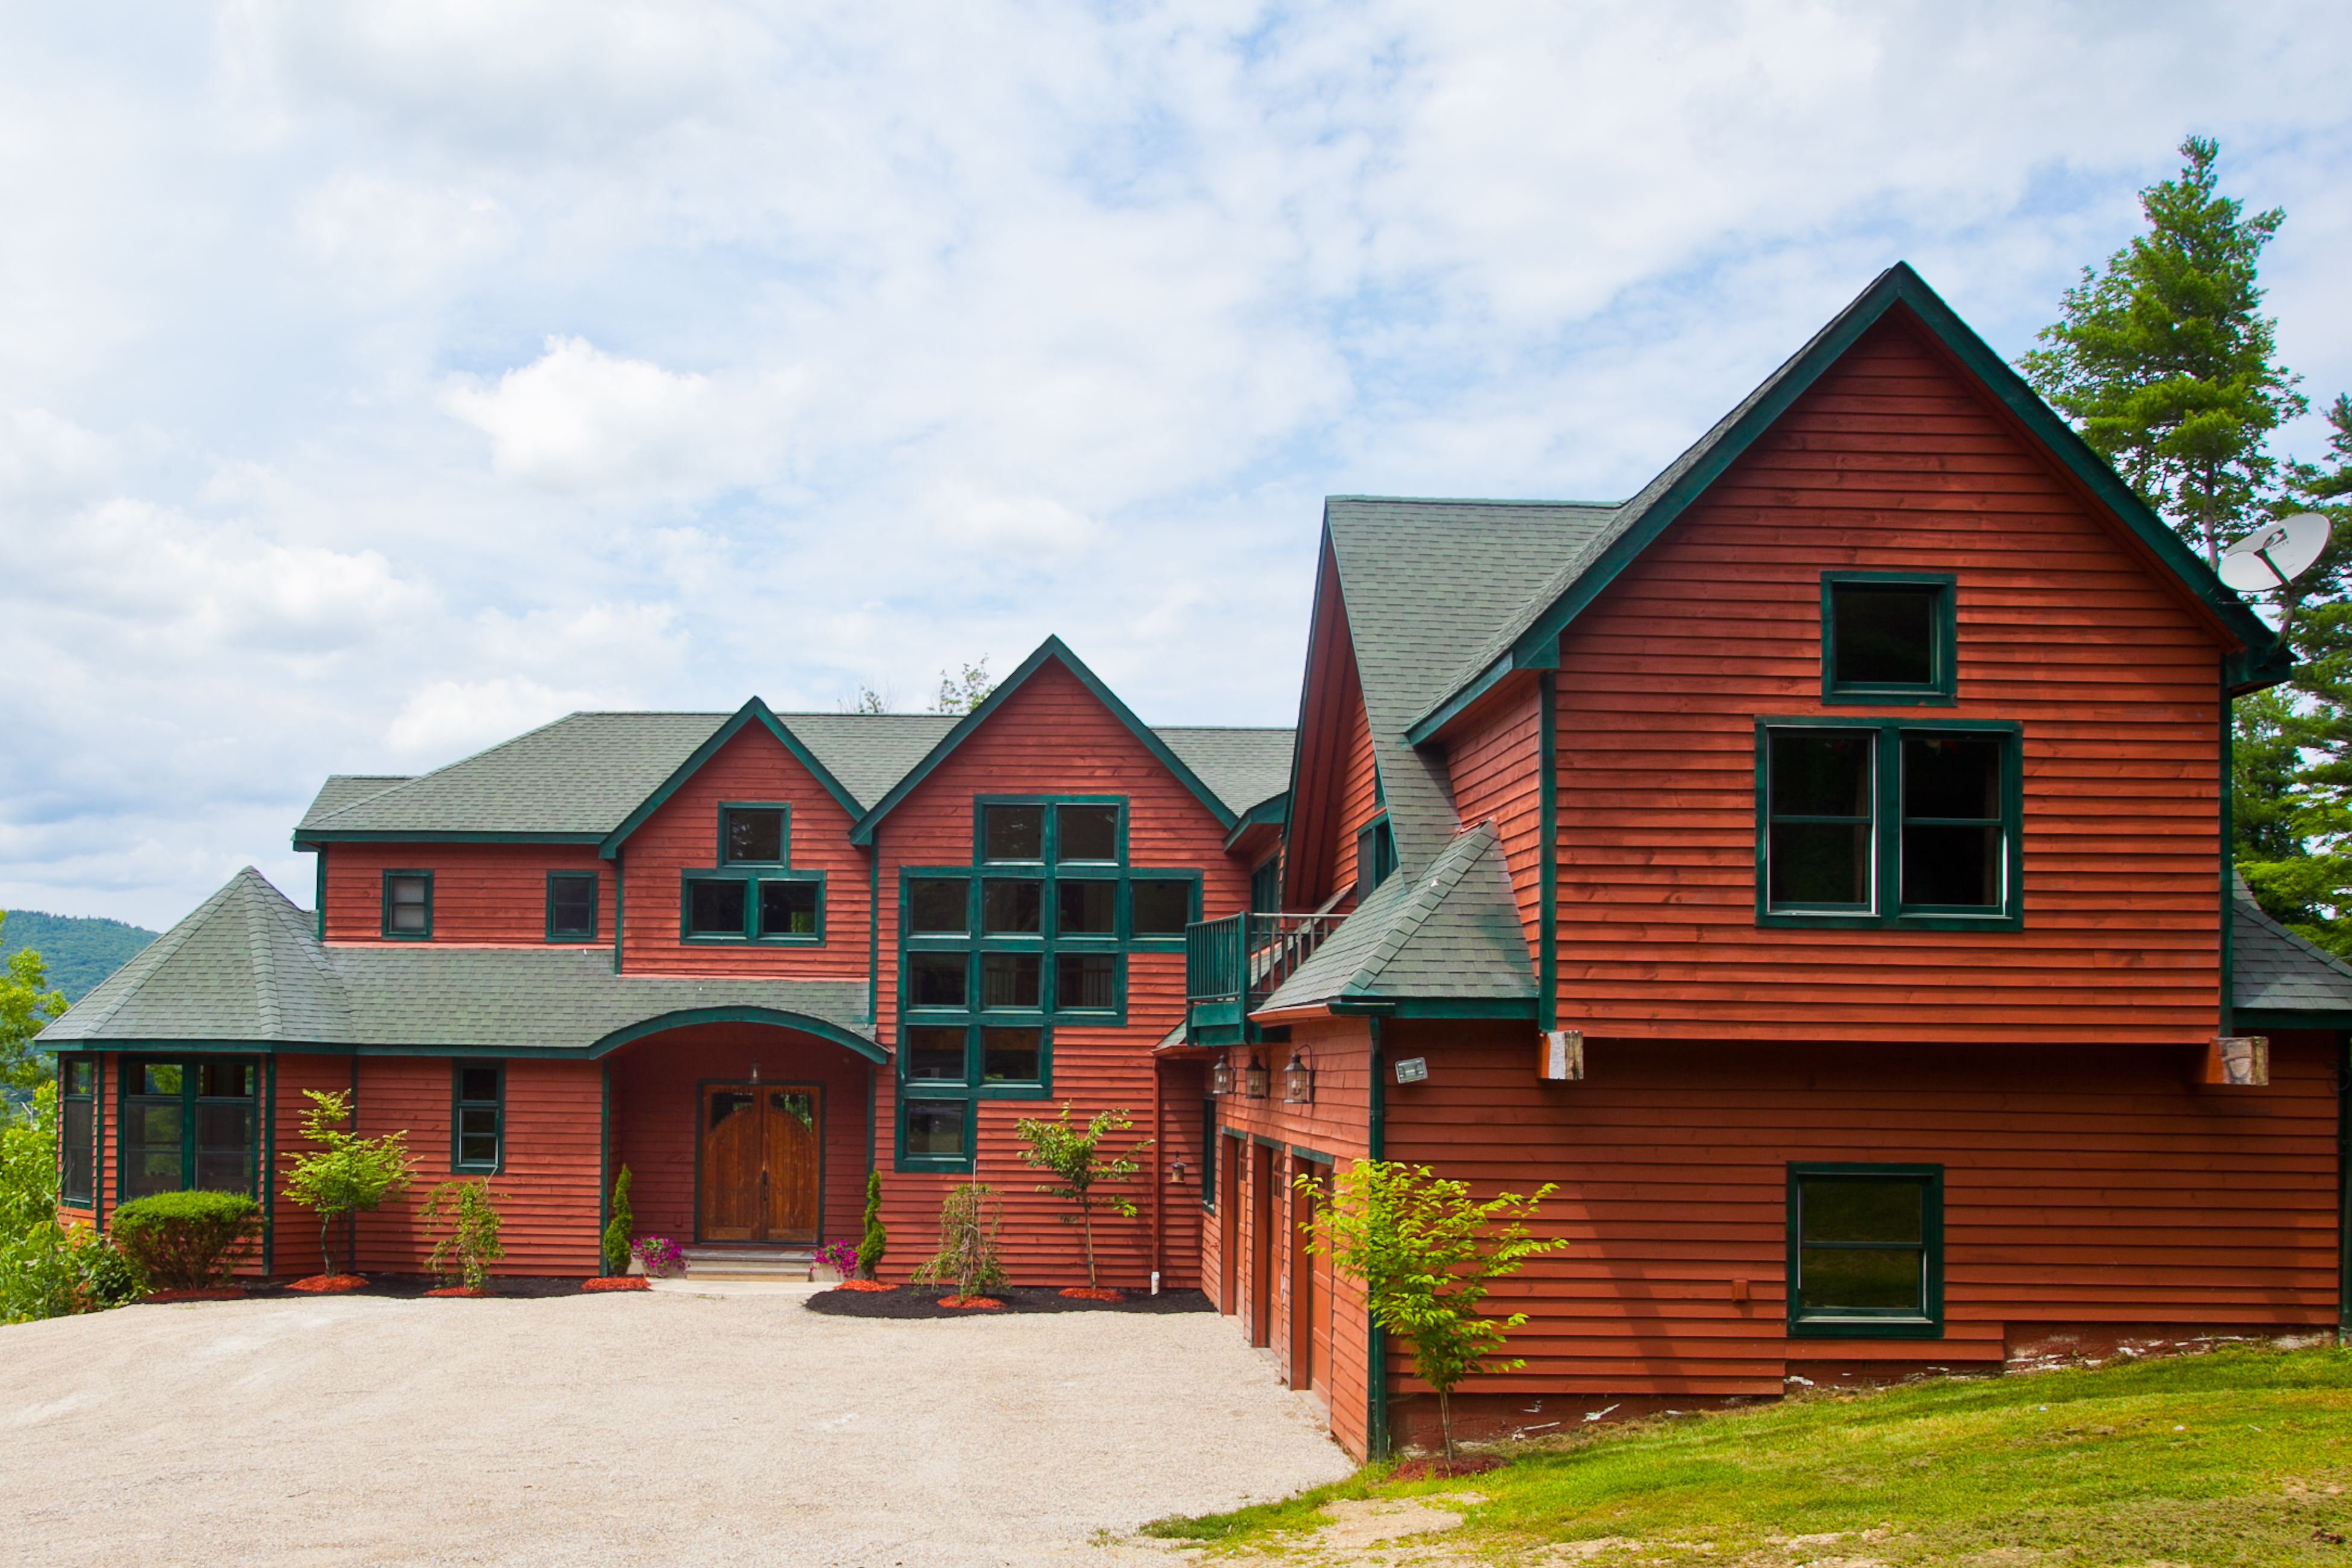 Casa Unifamiliar por un Venta en Sharon Modern Country Home 250 Low Rd Sharon, Connecticut 06069 Estados Unidos